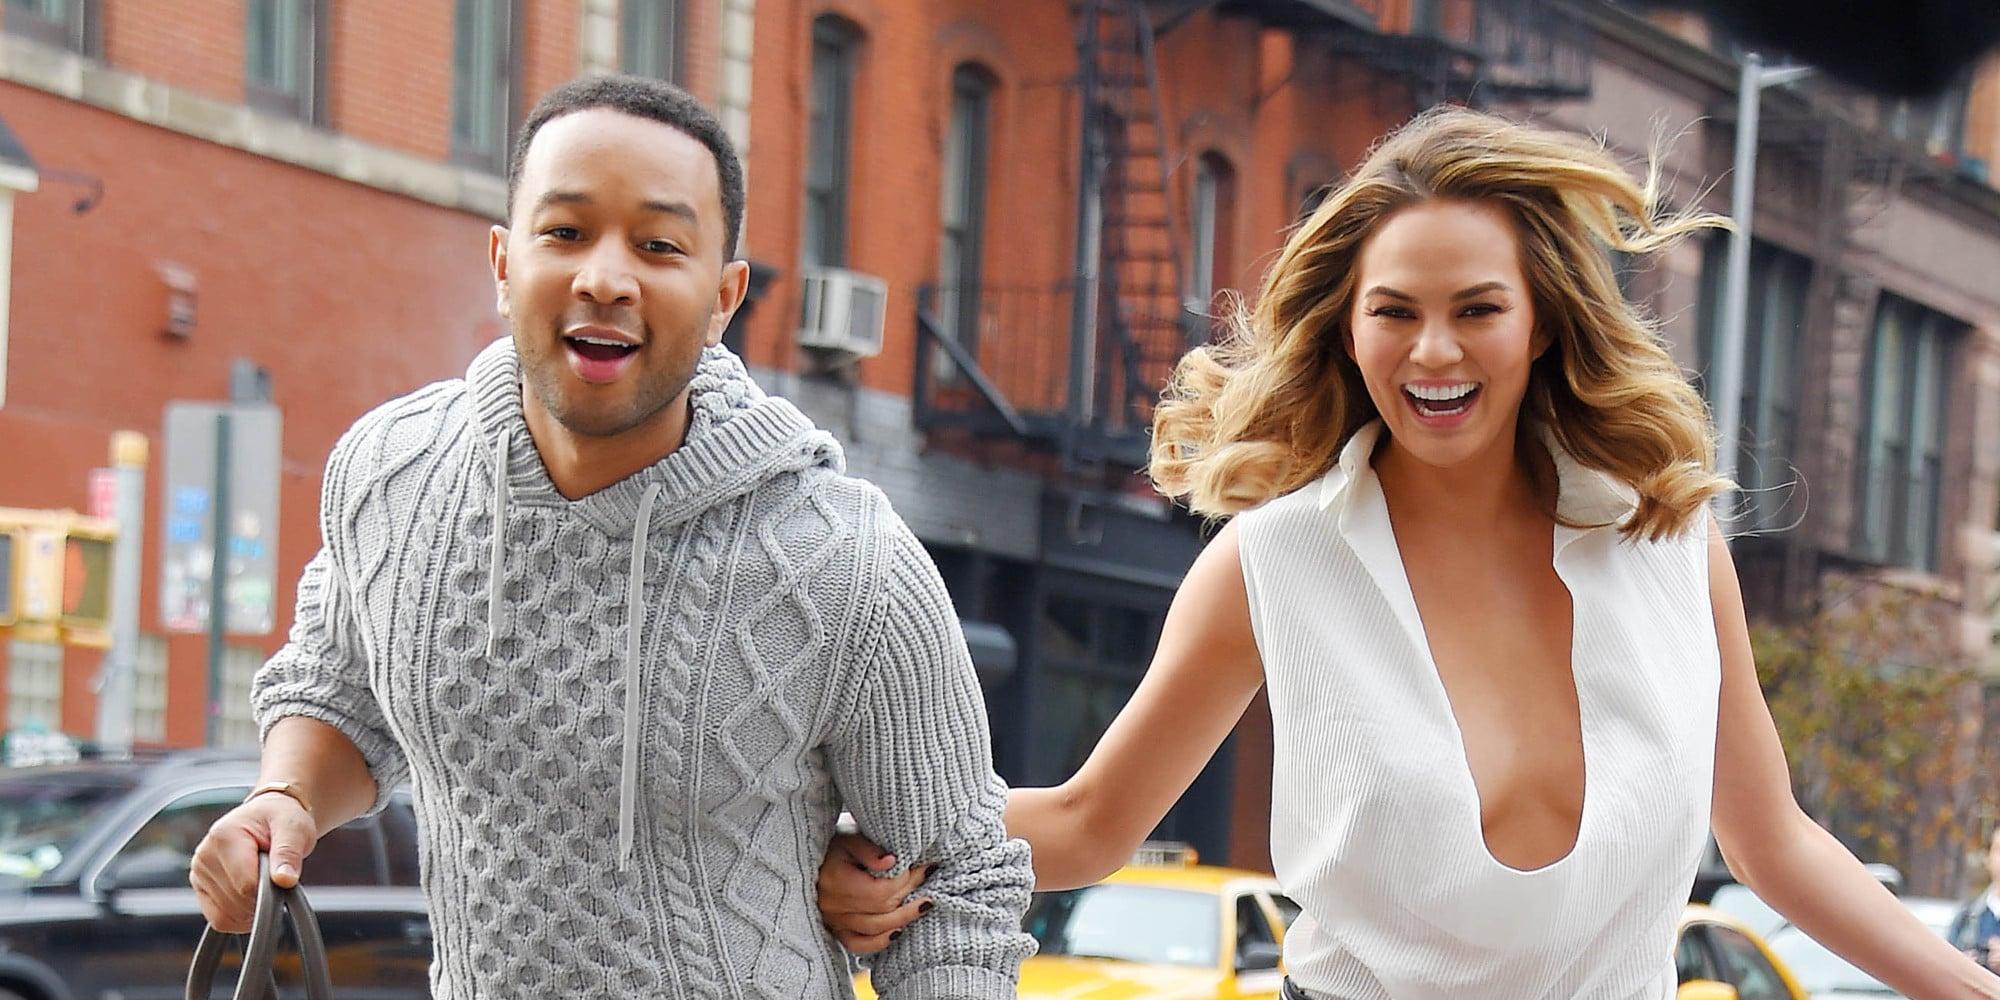 New York Ny - December 01: John Legend And Wife Chrissy Teigen Share Sighting On December 1, 2014 In New York City. (Photo By Josiah Kamau/Buzzfoto/Filmmagic)